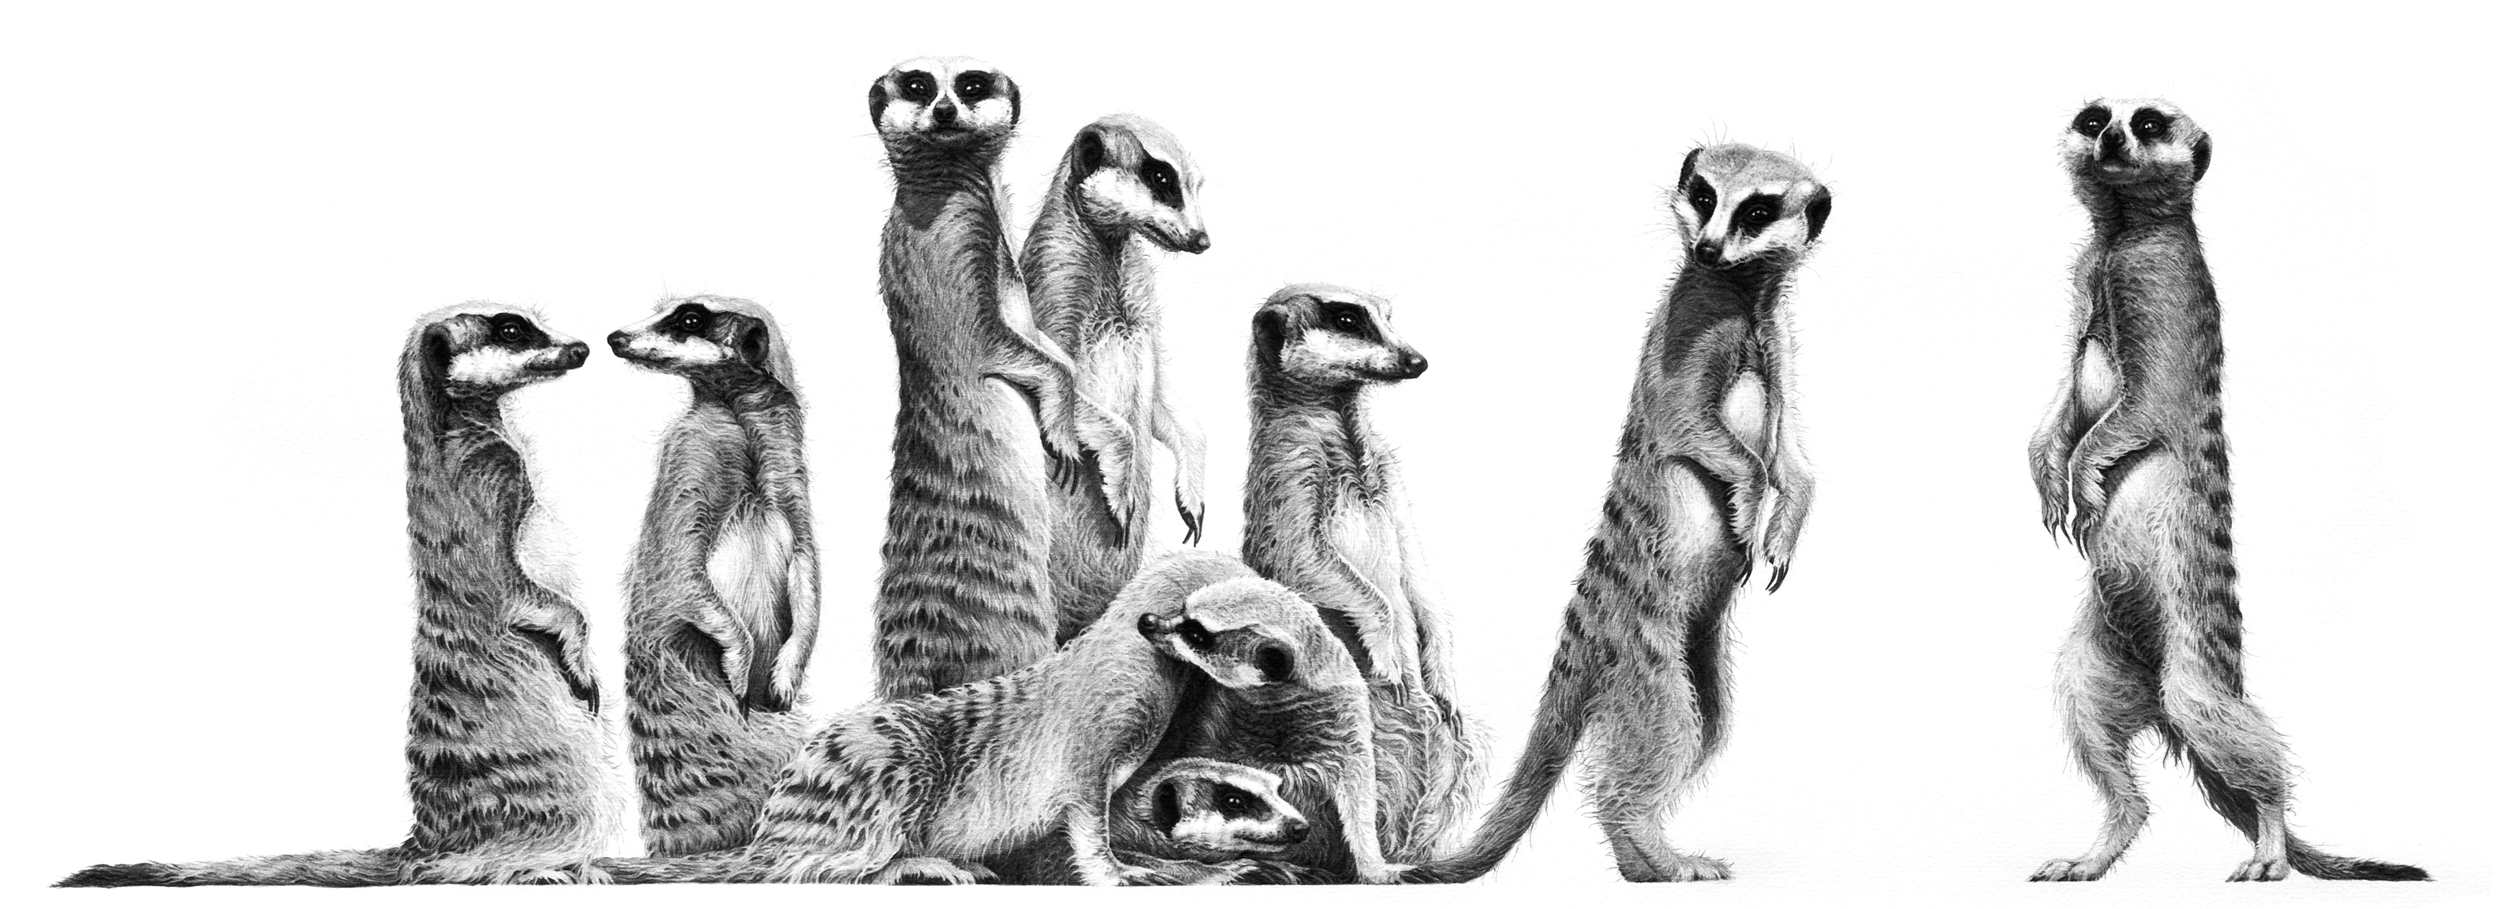 Family 2005 (meercats)